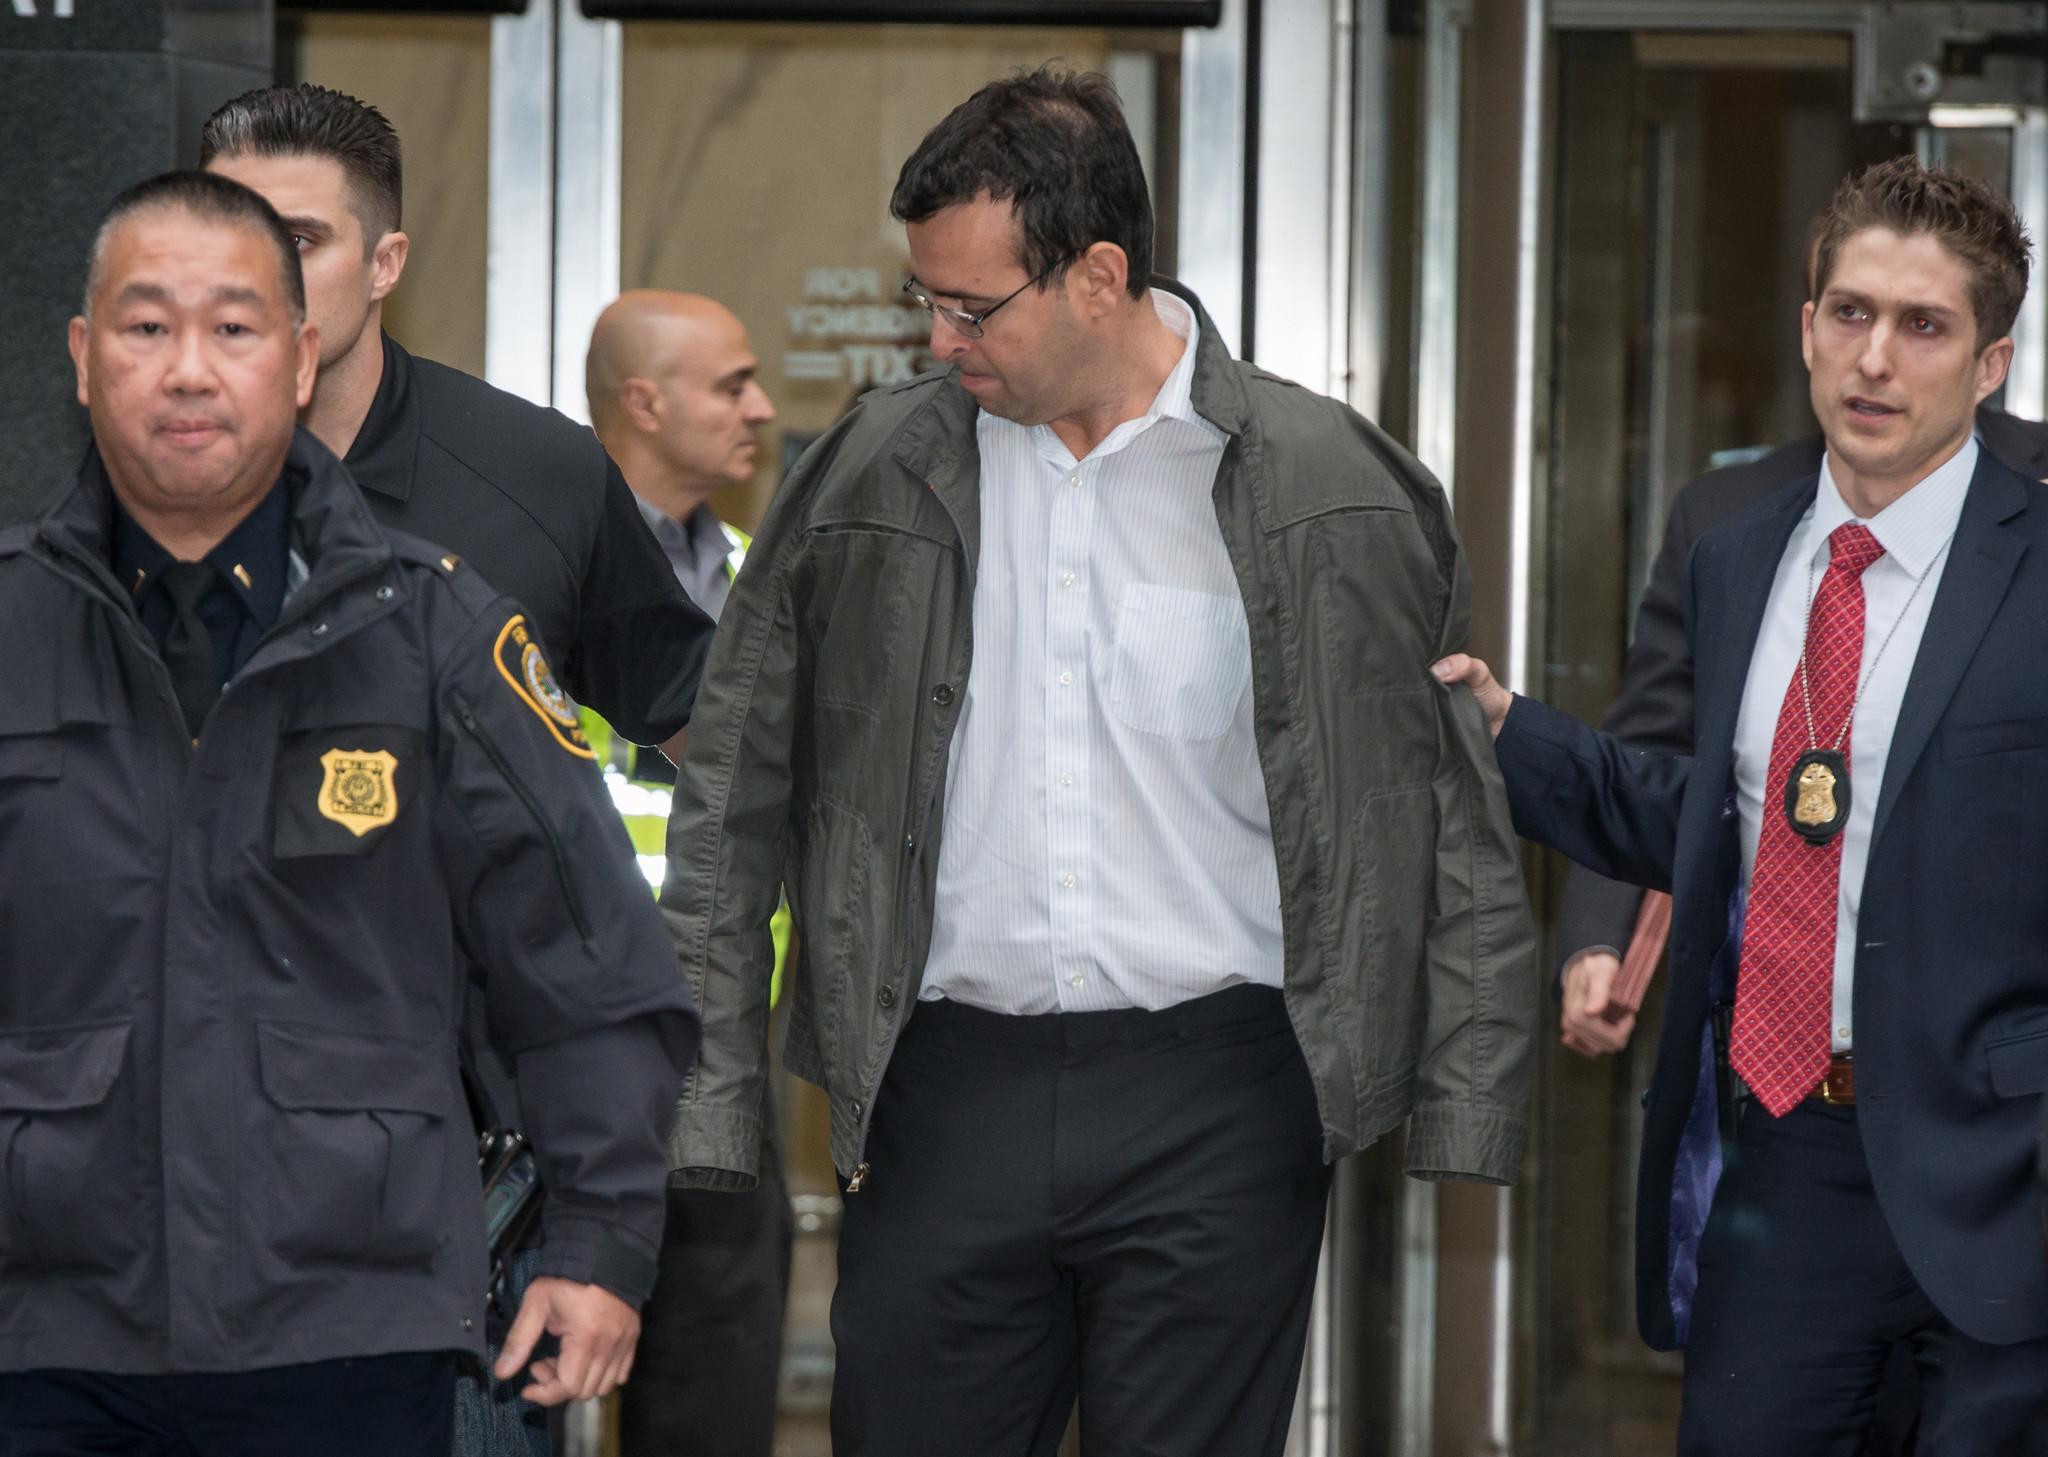 Martin Shkreli's lawyer wants no prison time, says 'Pharma Bro' was mastermind behind fraud crimes | New York Daily News